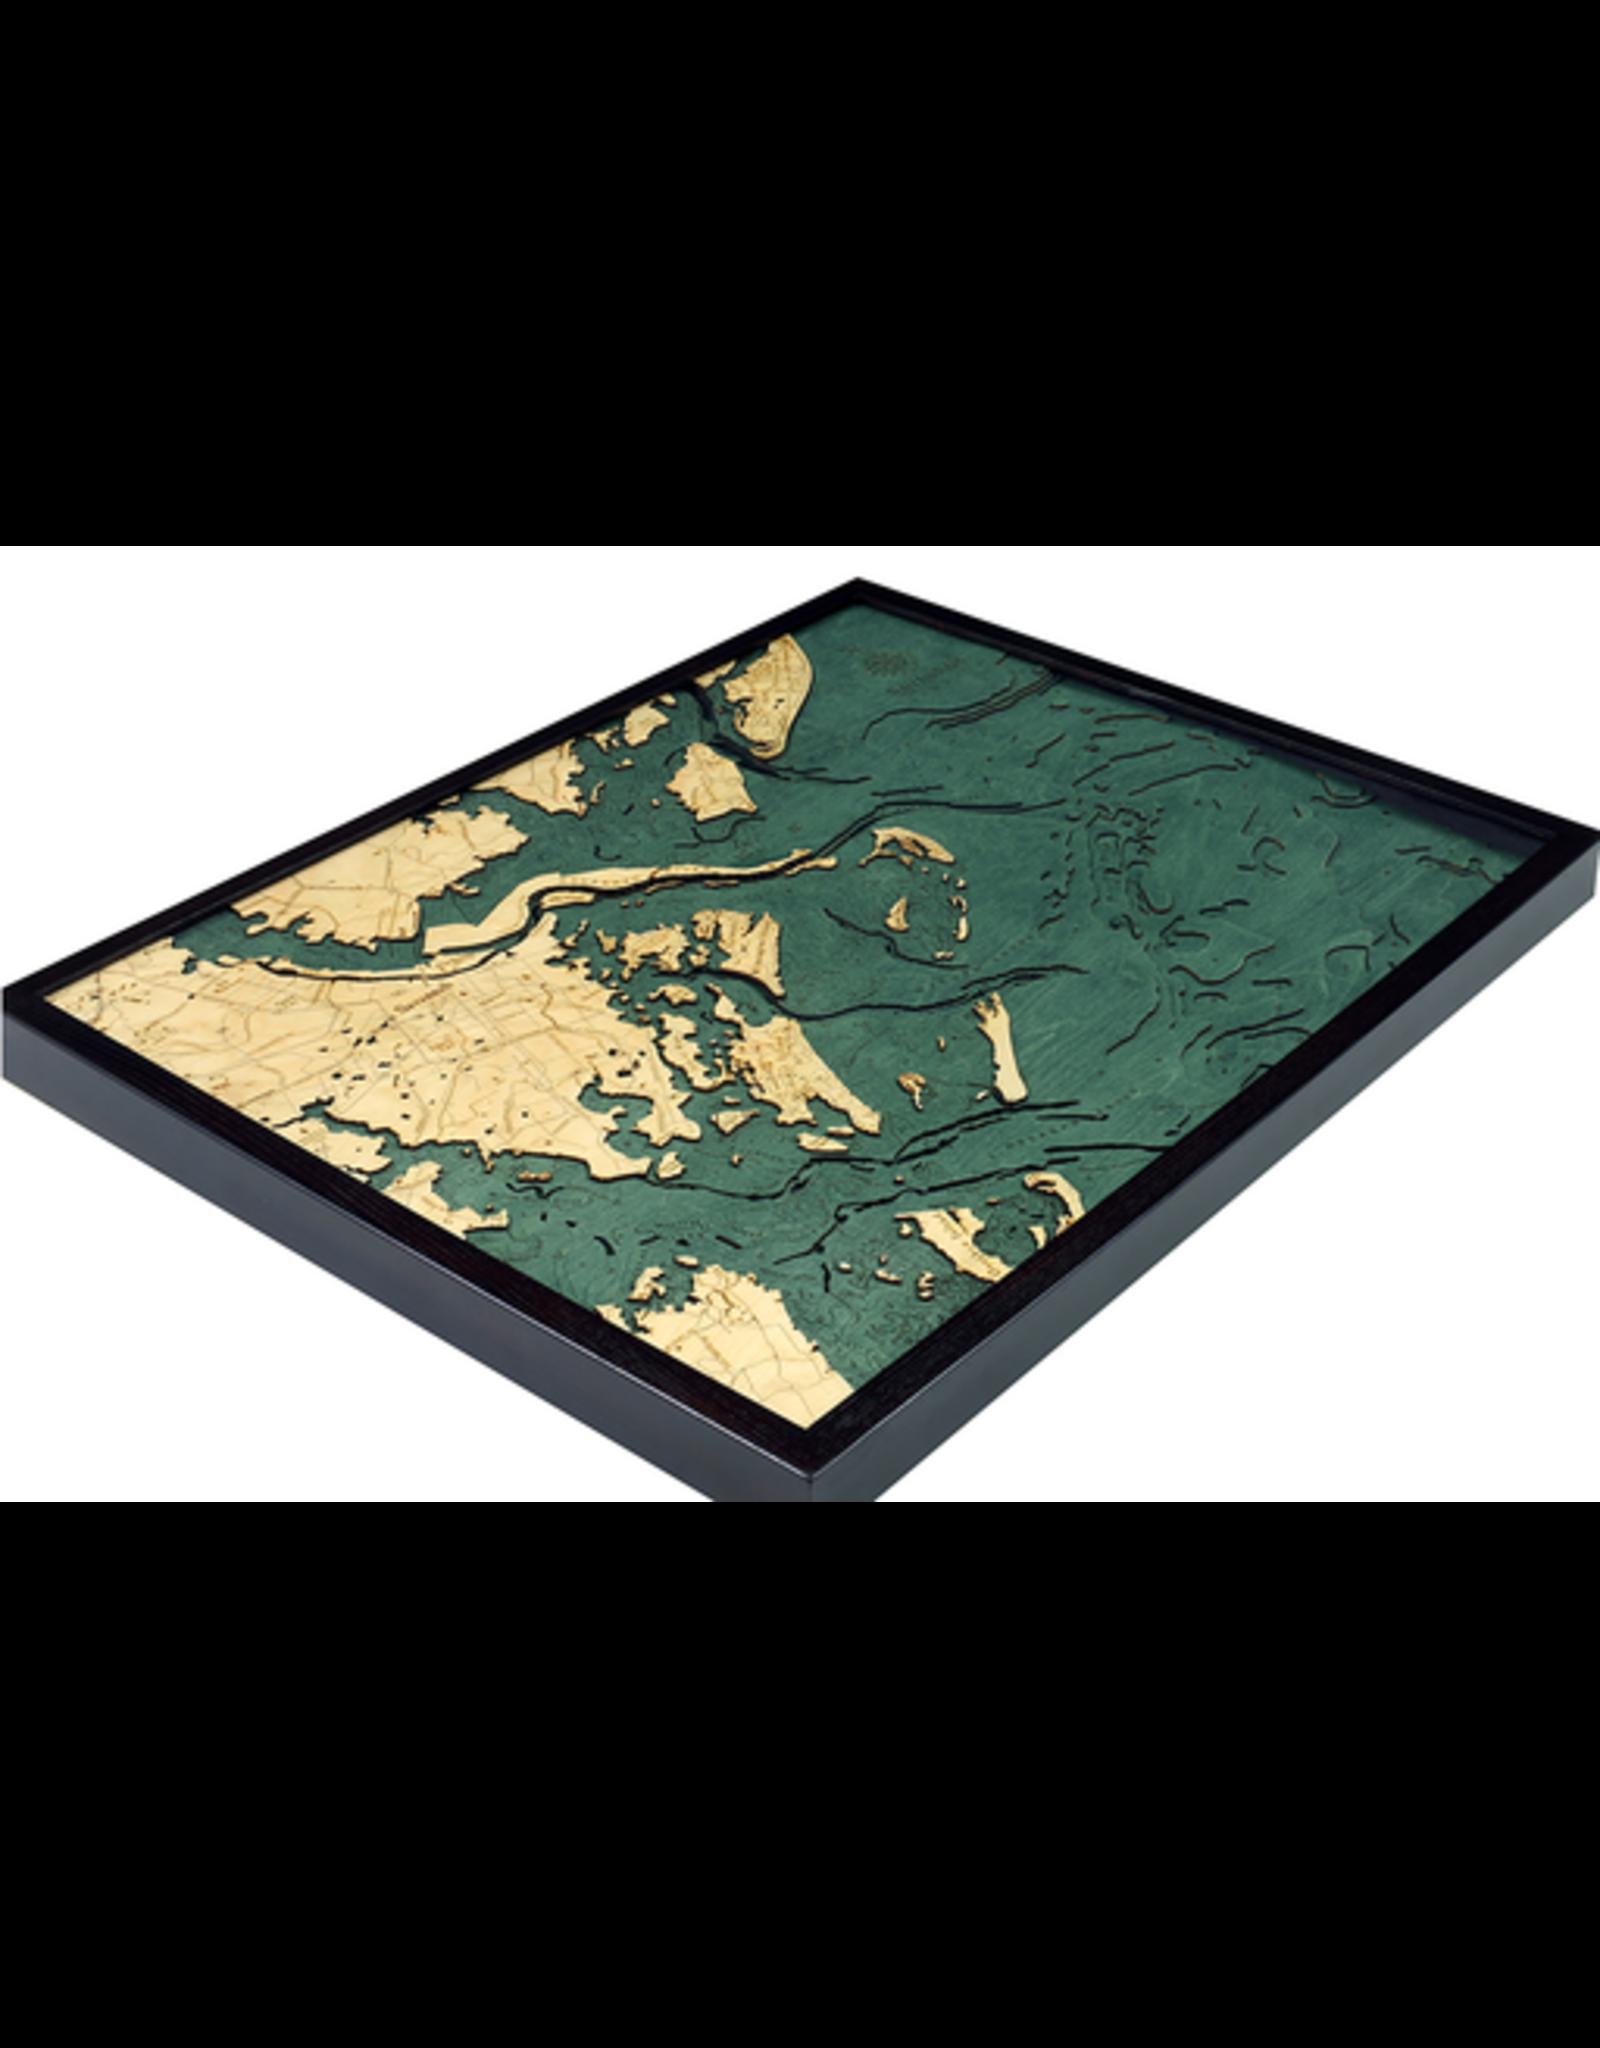 WoodCharts Savannah, GA (Bathymetric 3-D Wood Carved Nautical Chart)